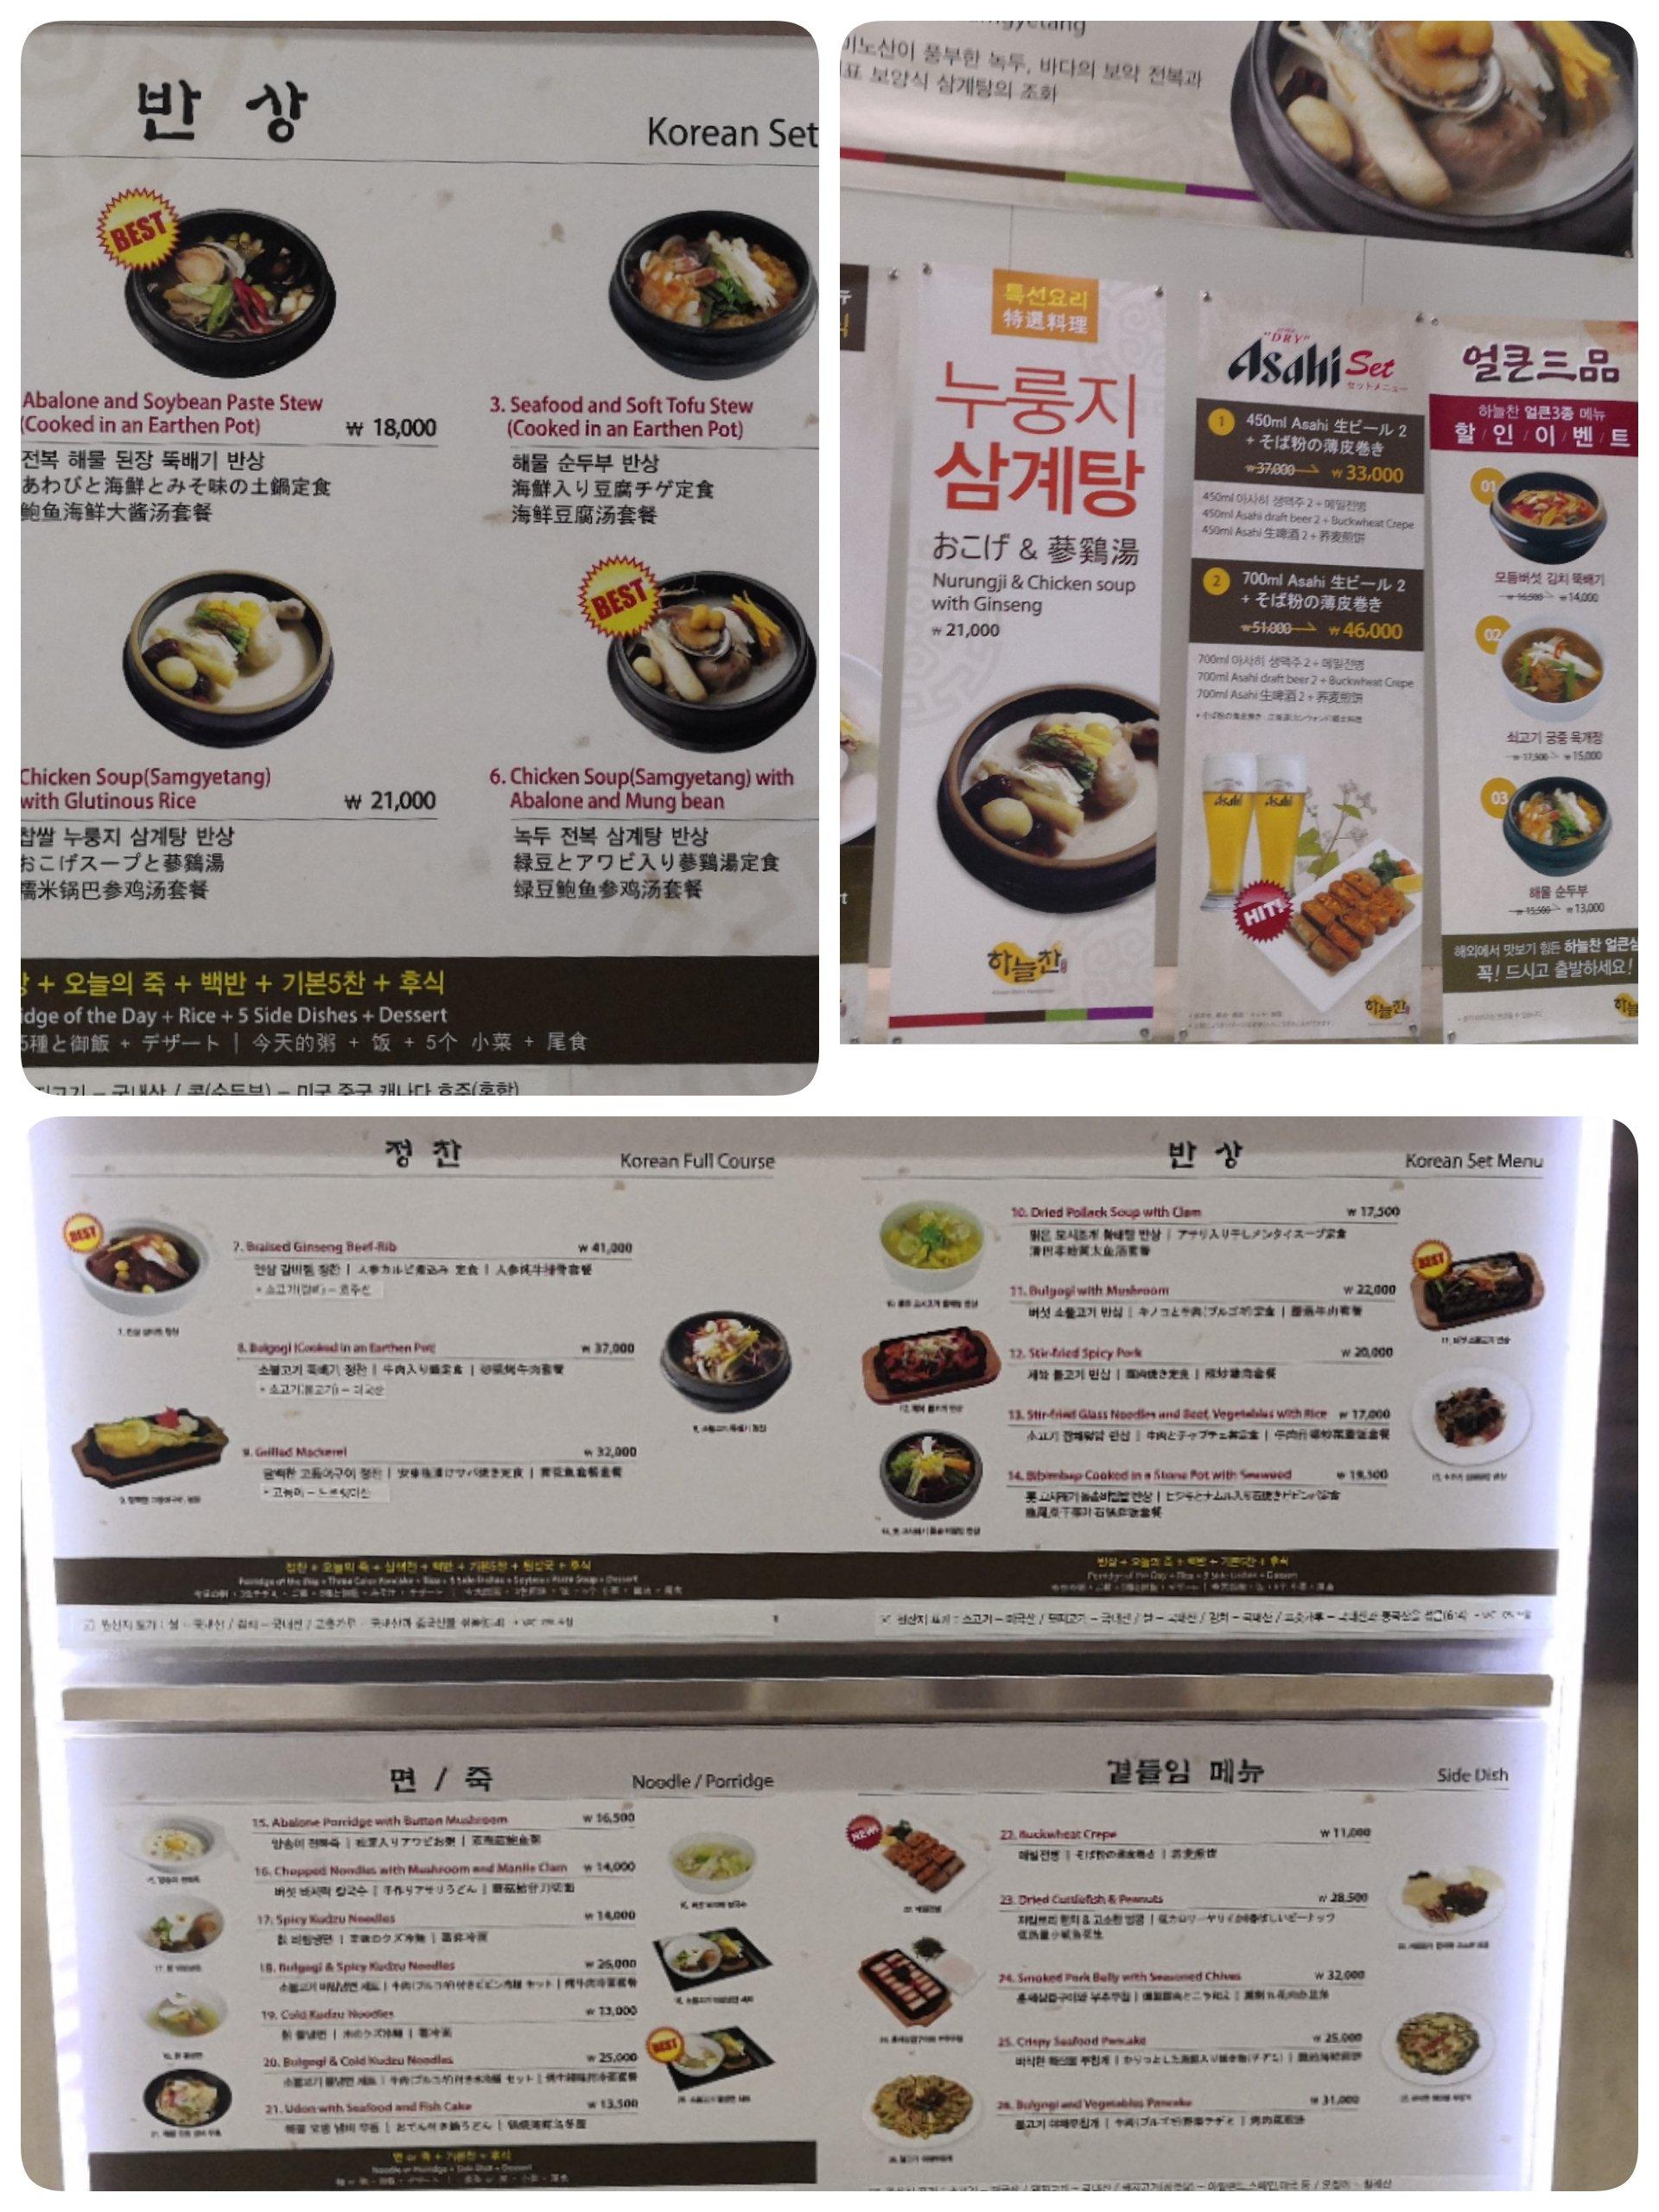 金浦空港食事韓国料理店メニュー